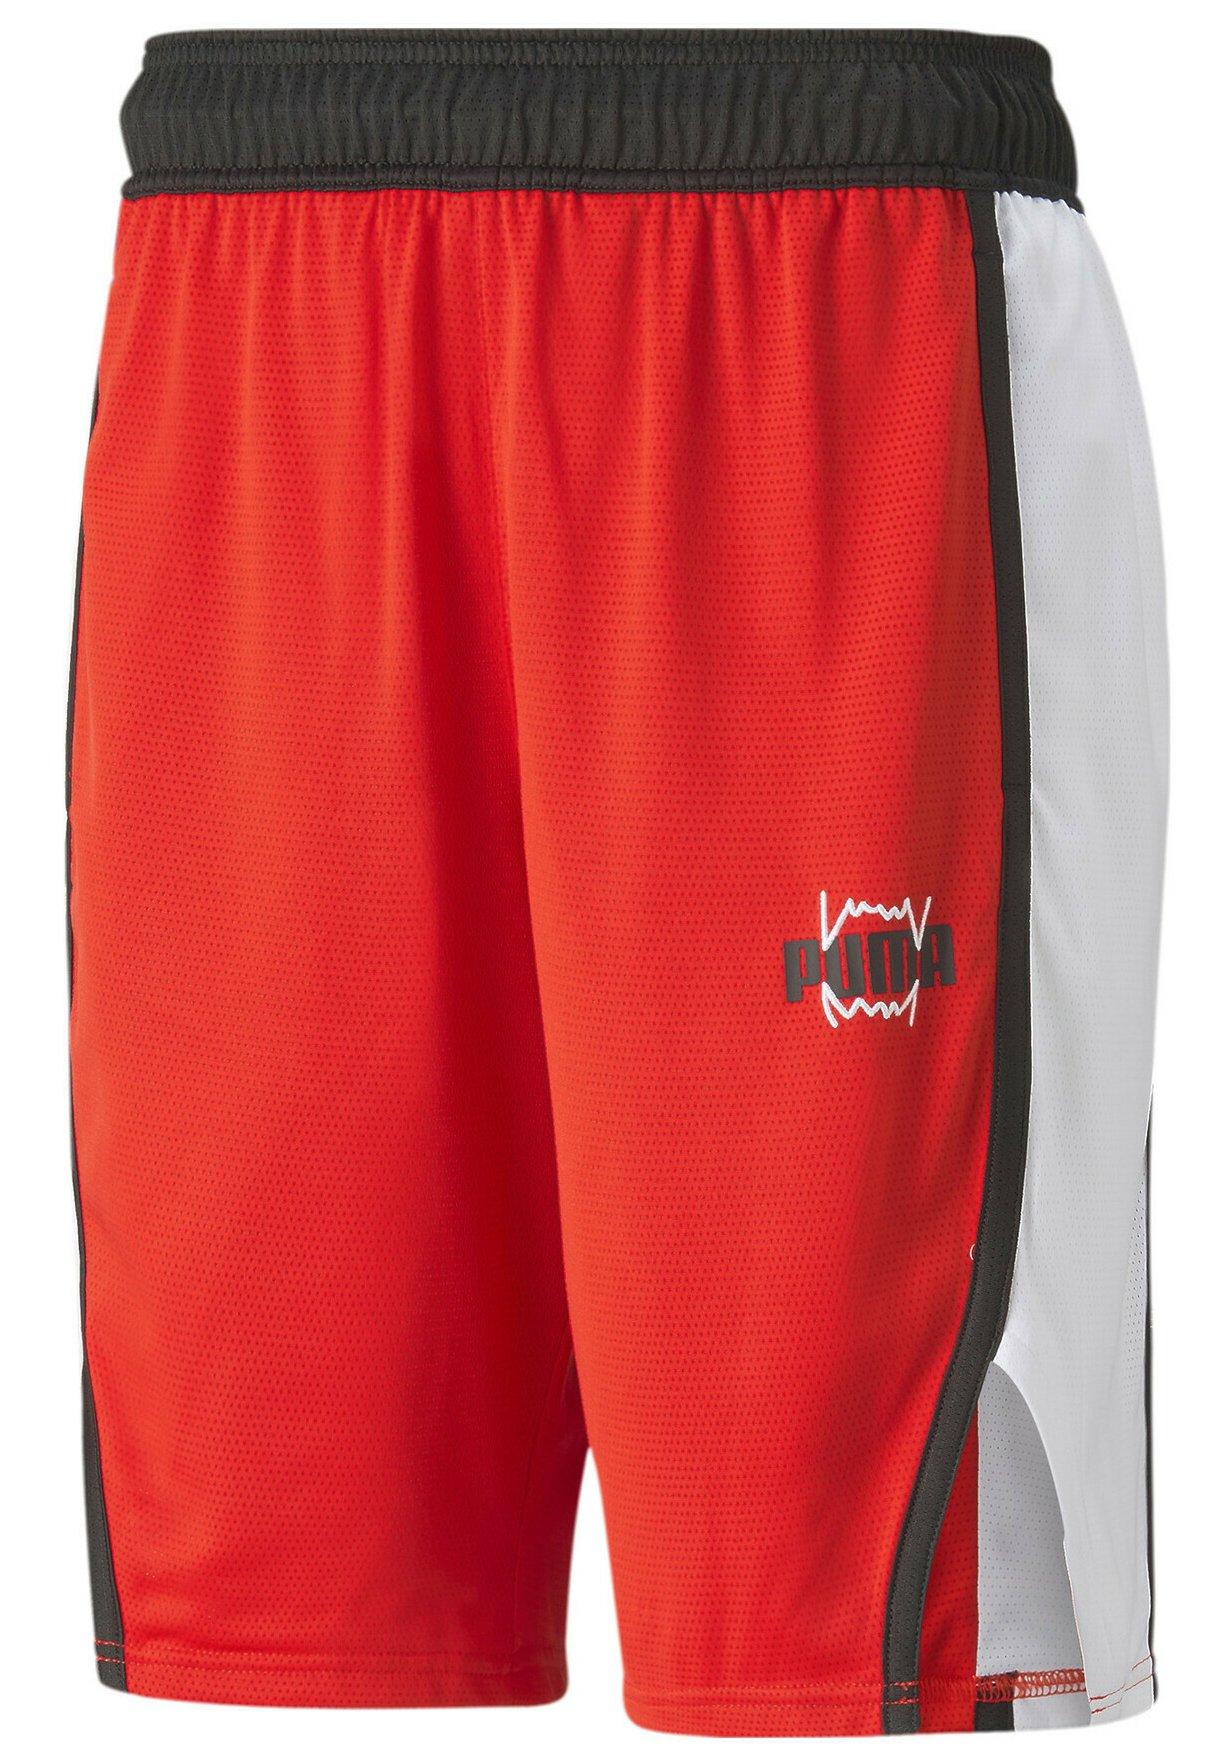 Uomo DERRICK JONES - Pantaloncini sportivi